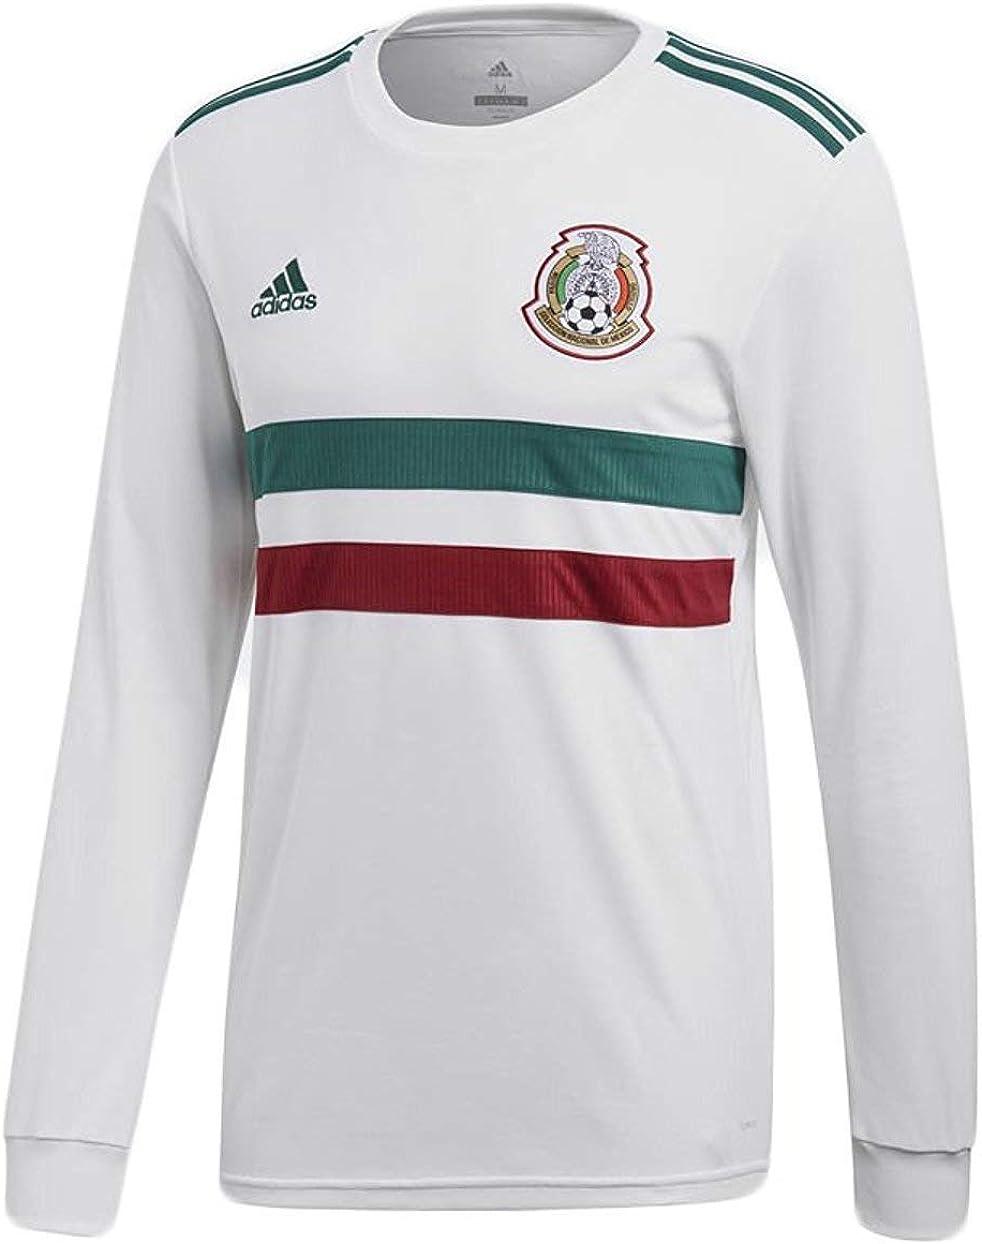 Amazon.com: adidas Mexico 2018/19 Away LS Jersey : Sports & Outdoors